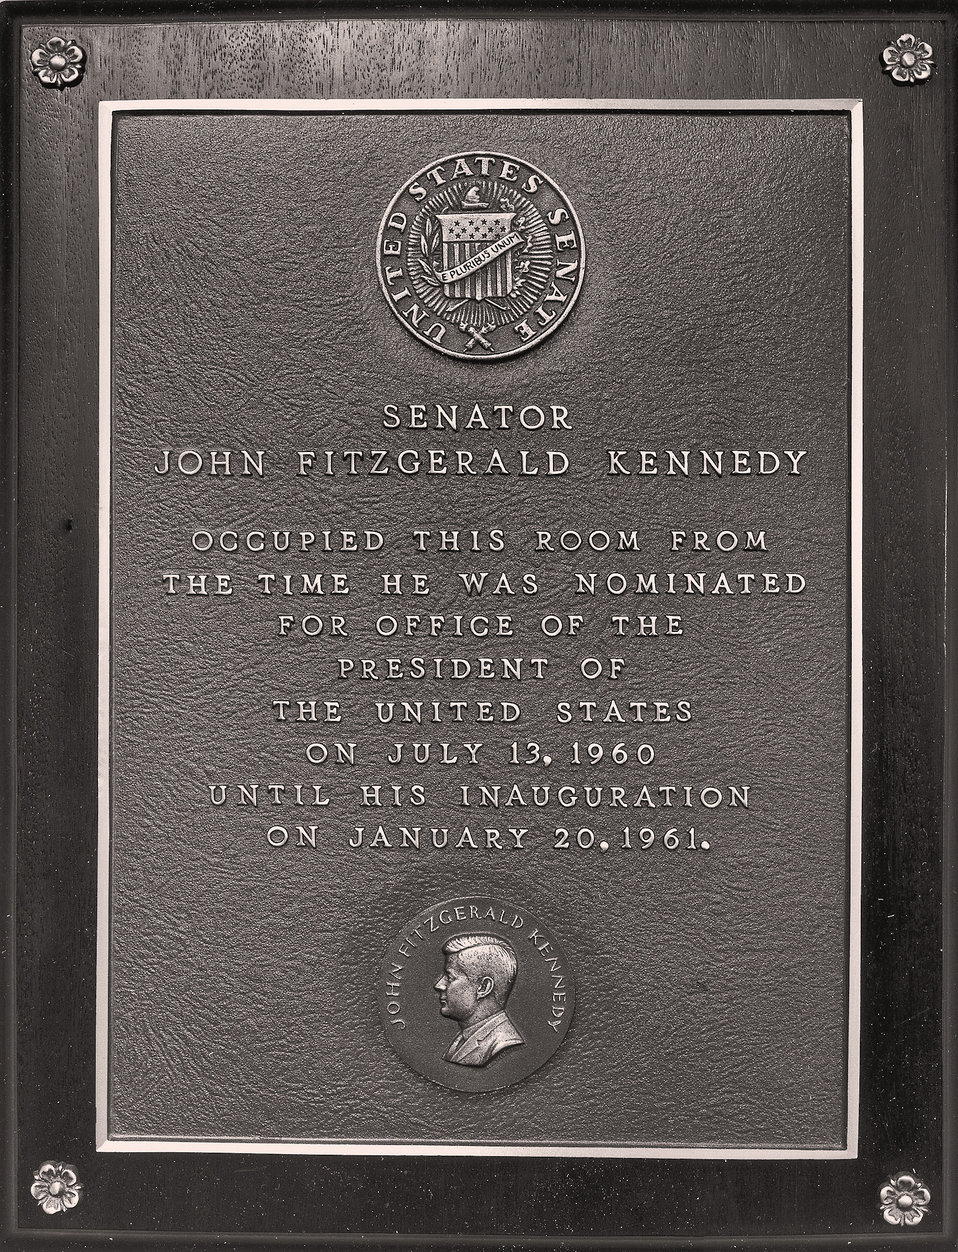 John F. Kennedy Room Plaque